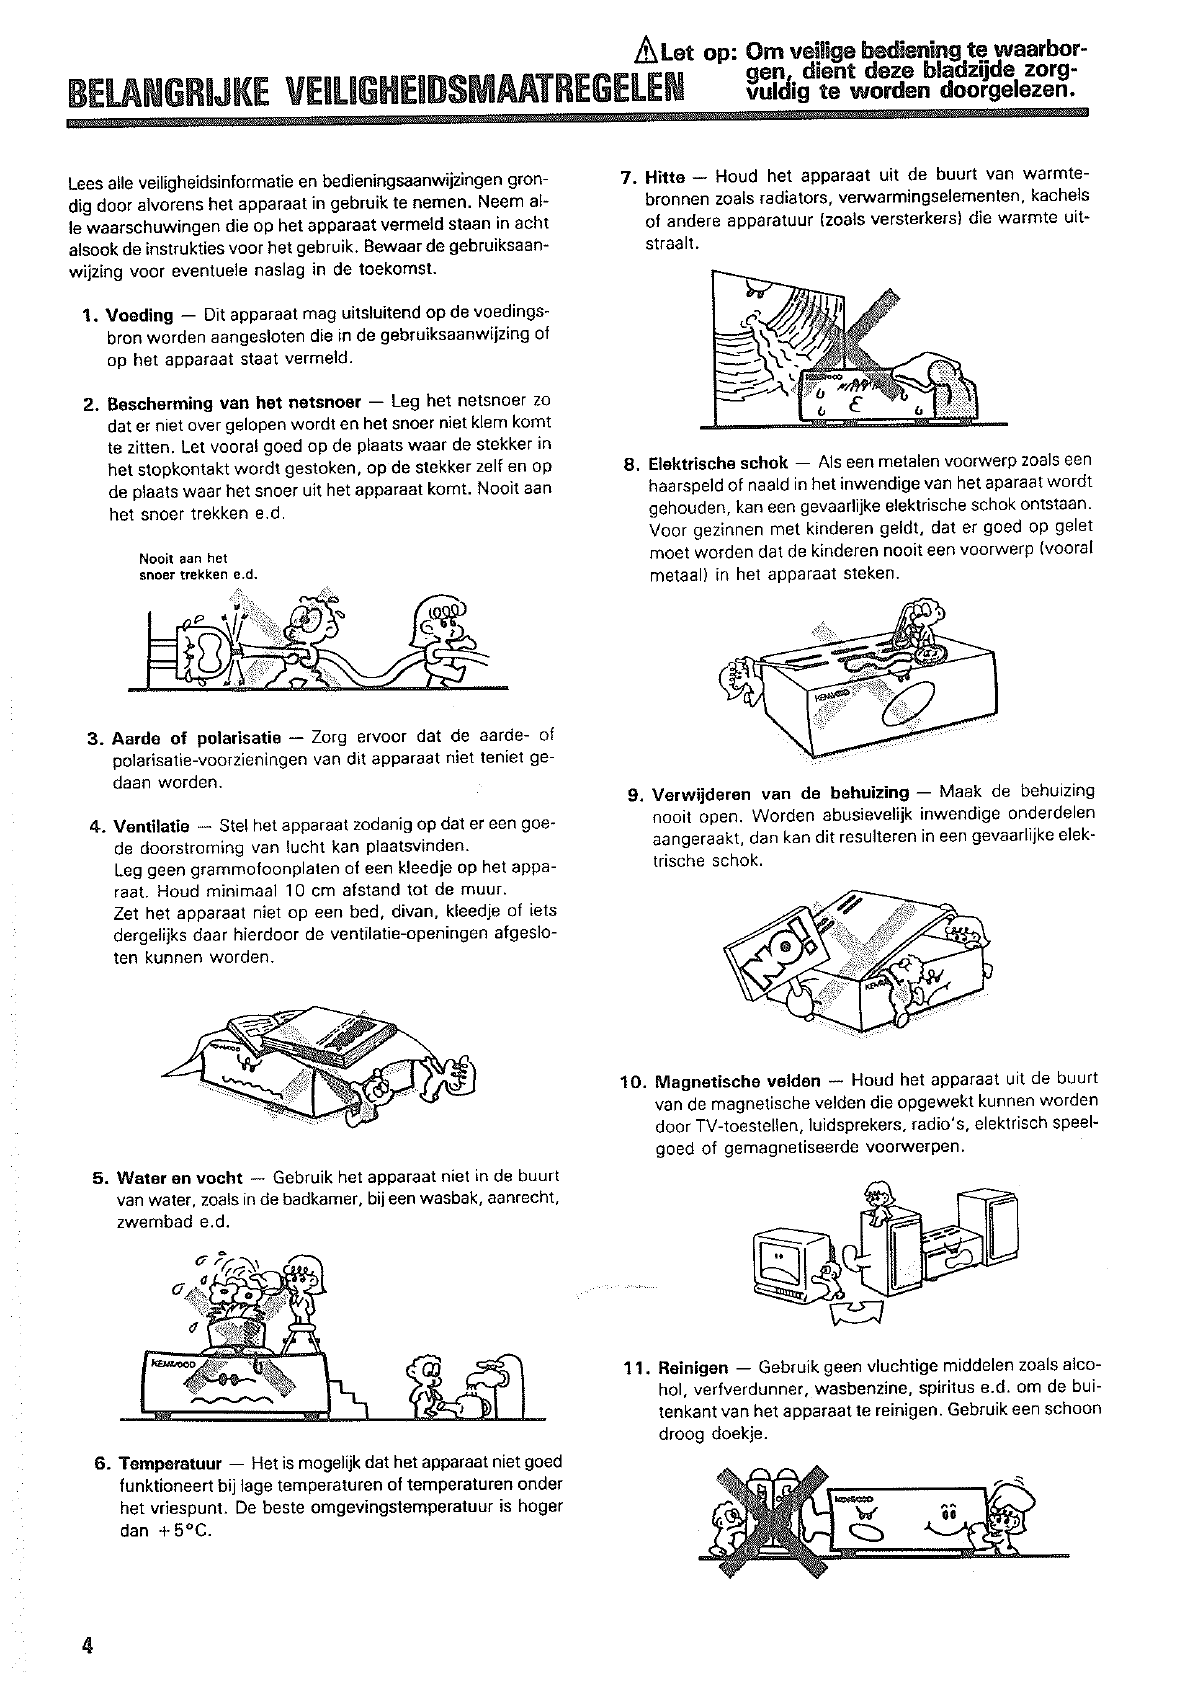 Manual Kenwood Midi M-757 (page 4 of 46) (Dutch)